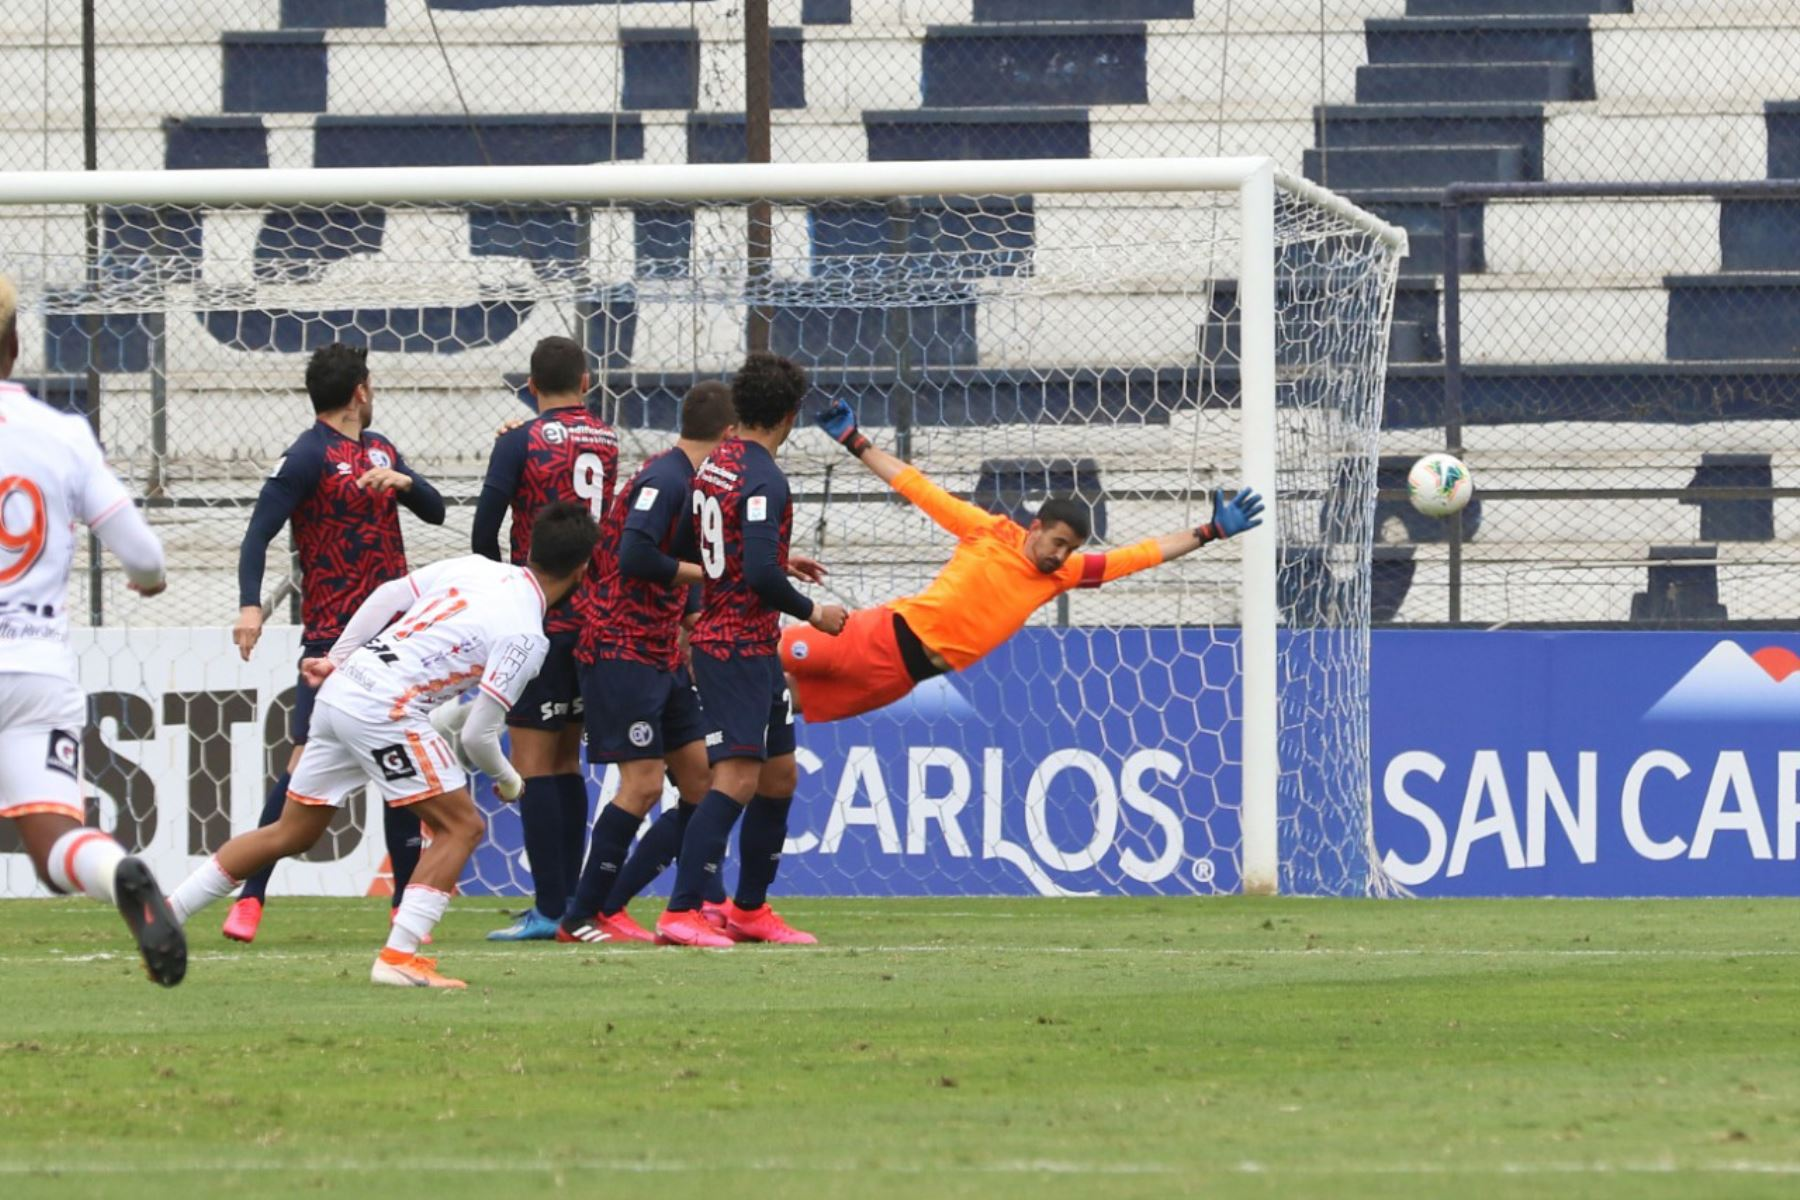 Deportivo Municipal vence 2 a 1 a Ayacucho FC por la jornada 11 de la Liga 1 que se disputa en el estadio Miguel Grau del Callao. Foto: @LigaFutProf